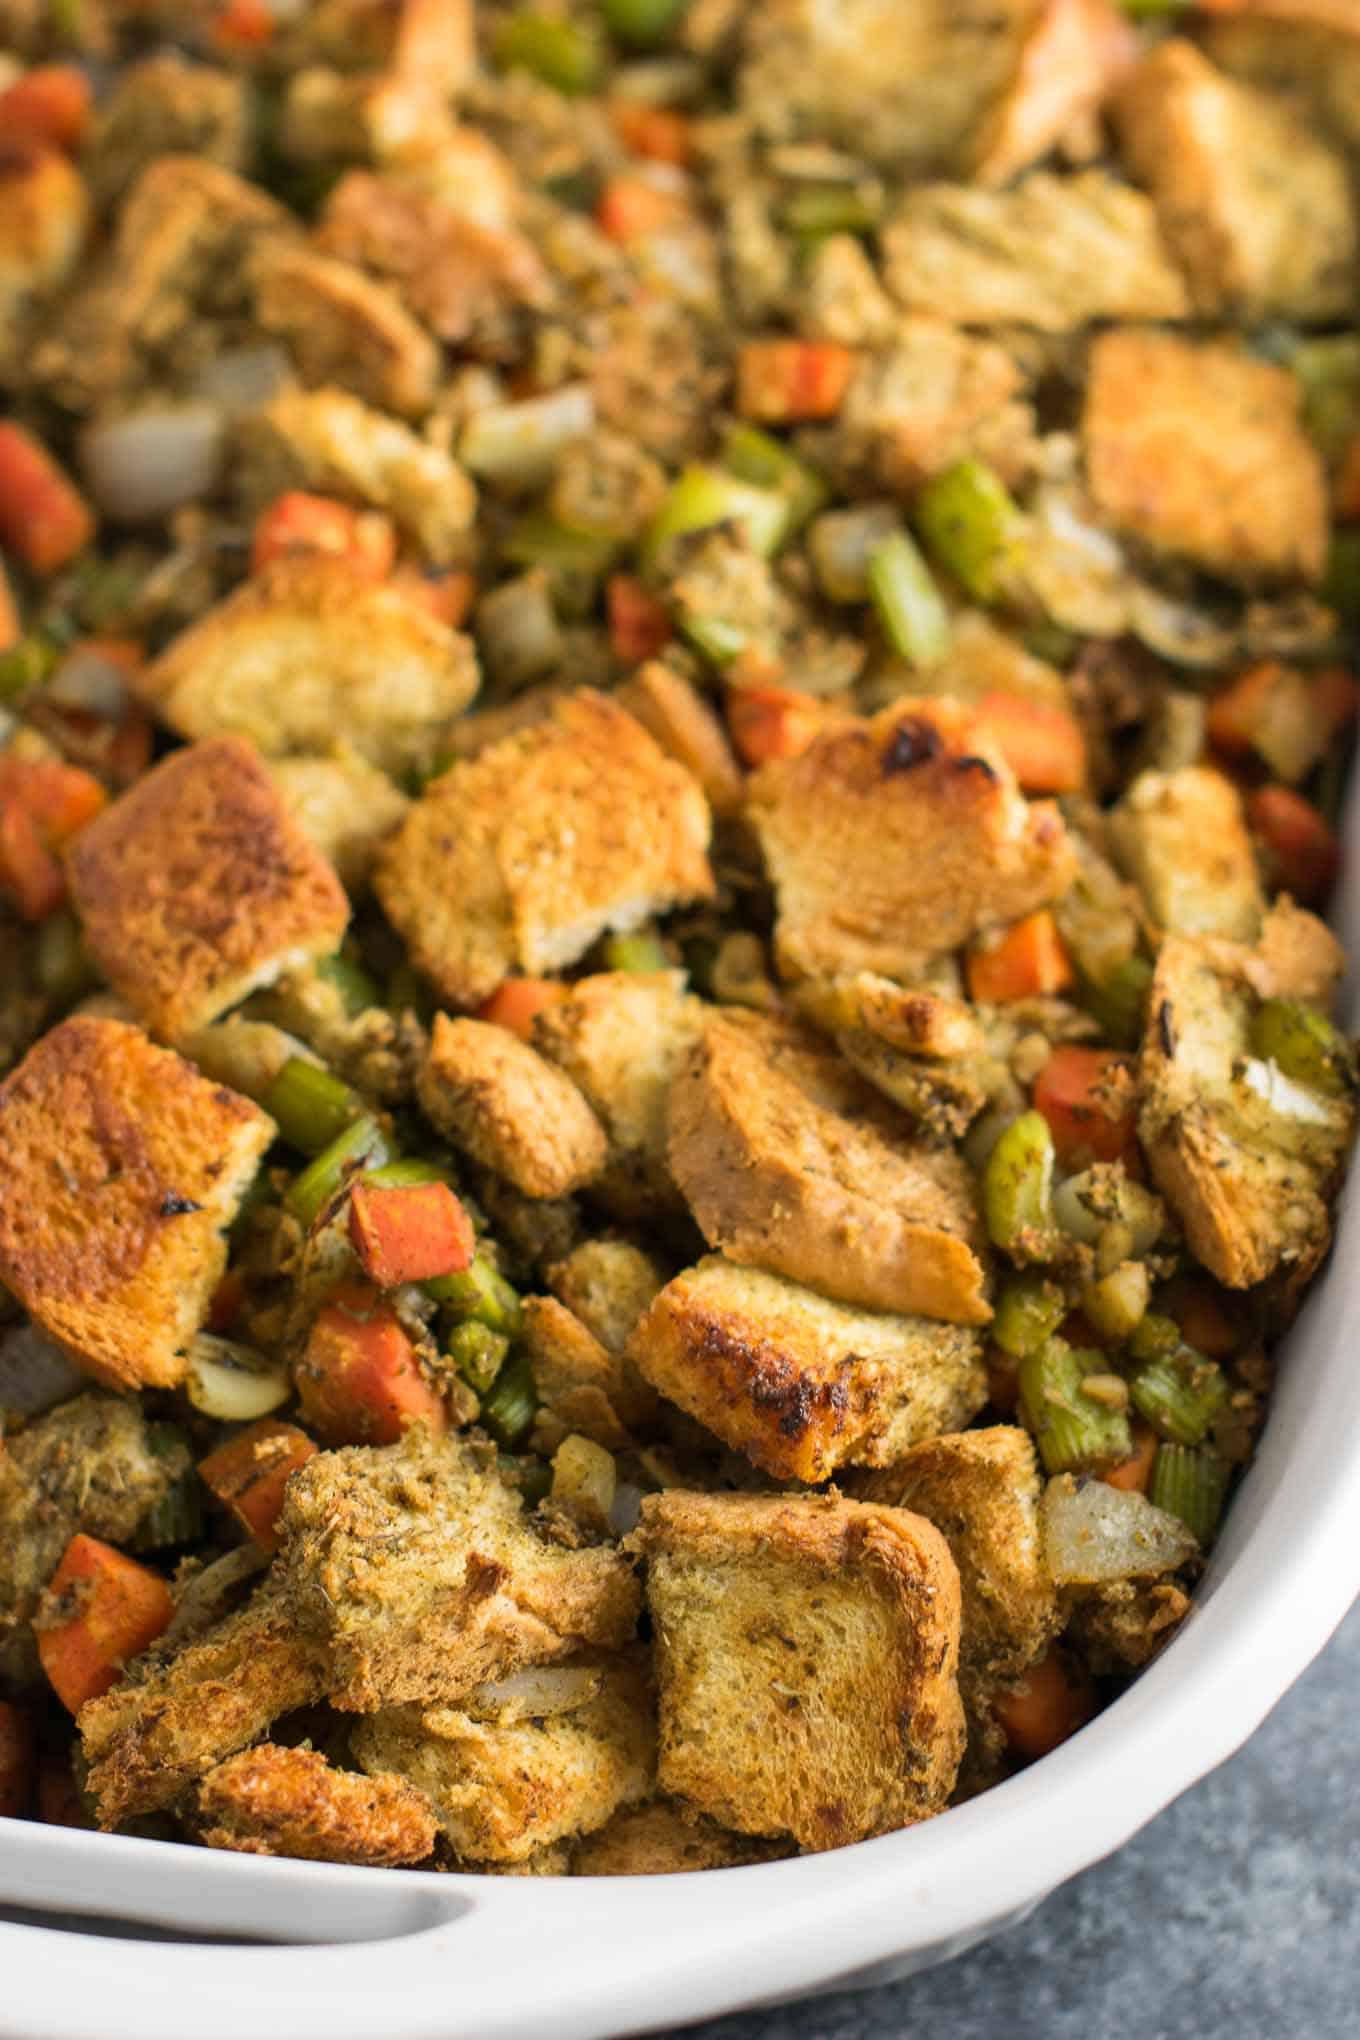 Vegan Stuffing Recipes For Thanksgiving  Easy Vegan Stuffing Recipe gluten free dairy free